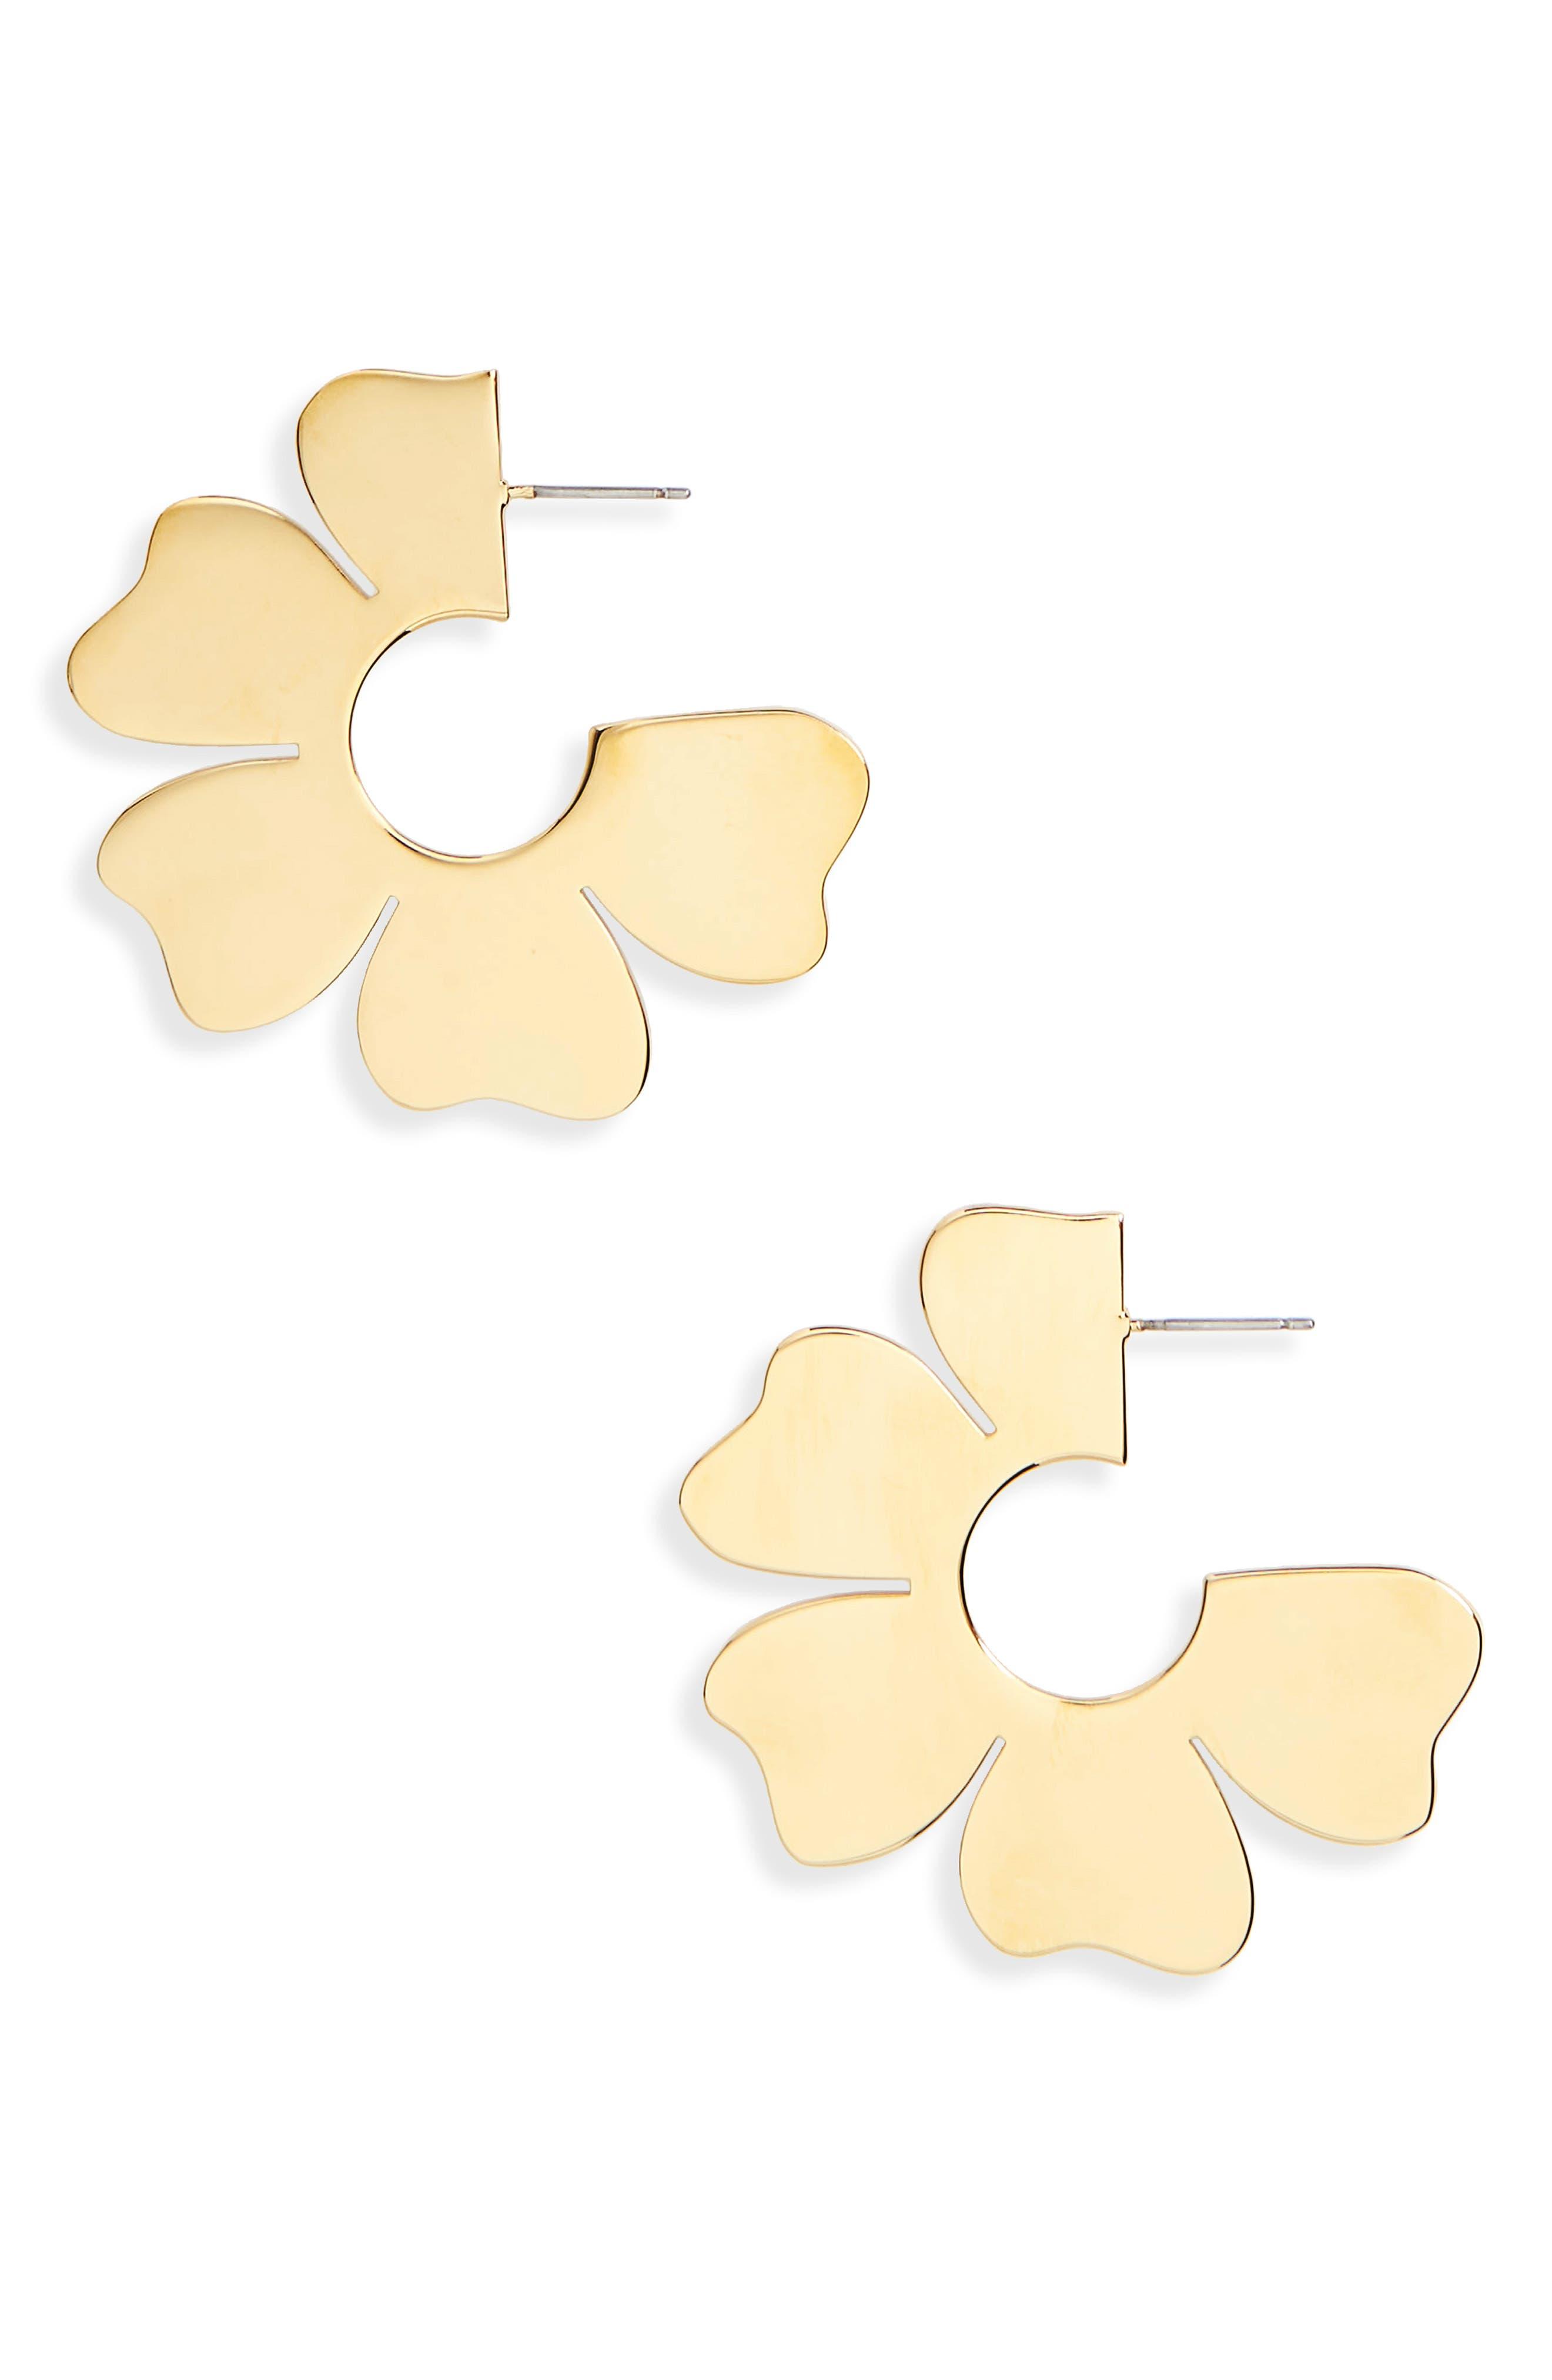 J.Crew Flat Flower Hoop Earrings,                             Main thumbnail 1, color,                             Gold